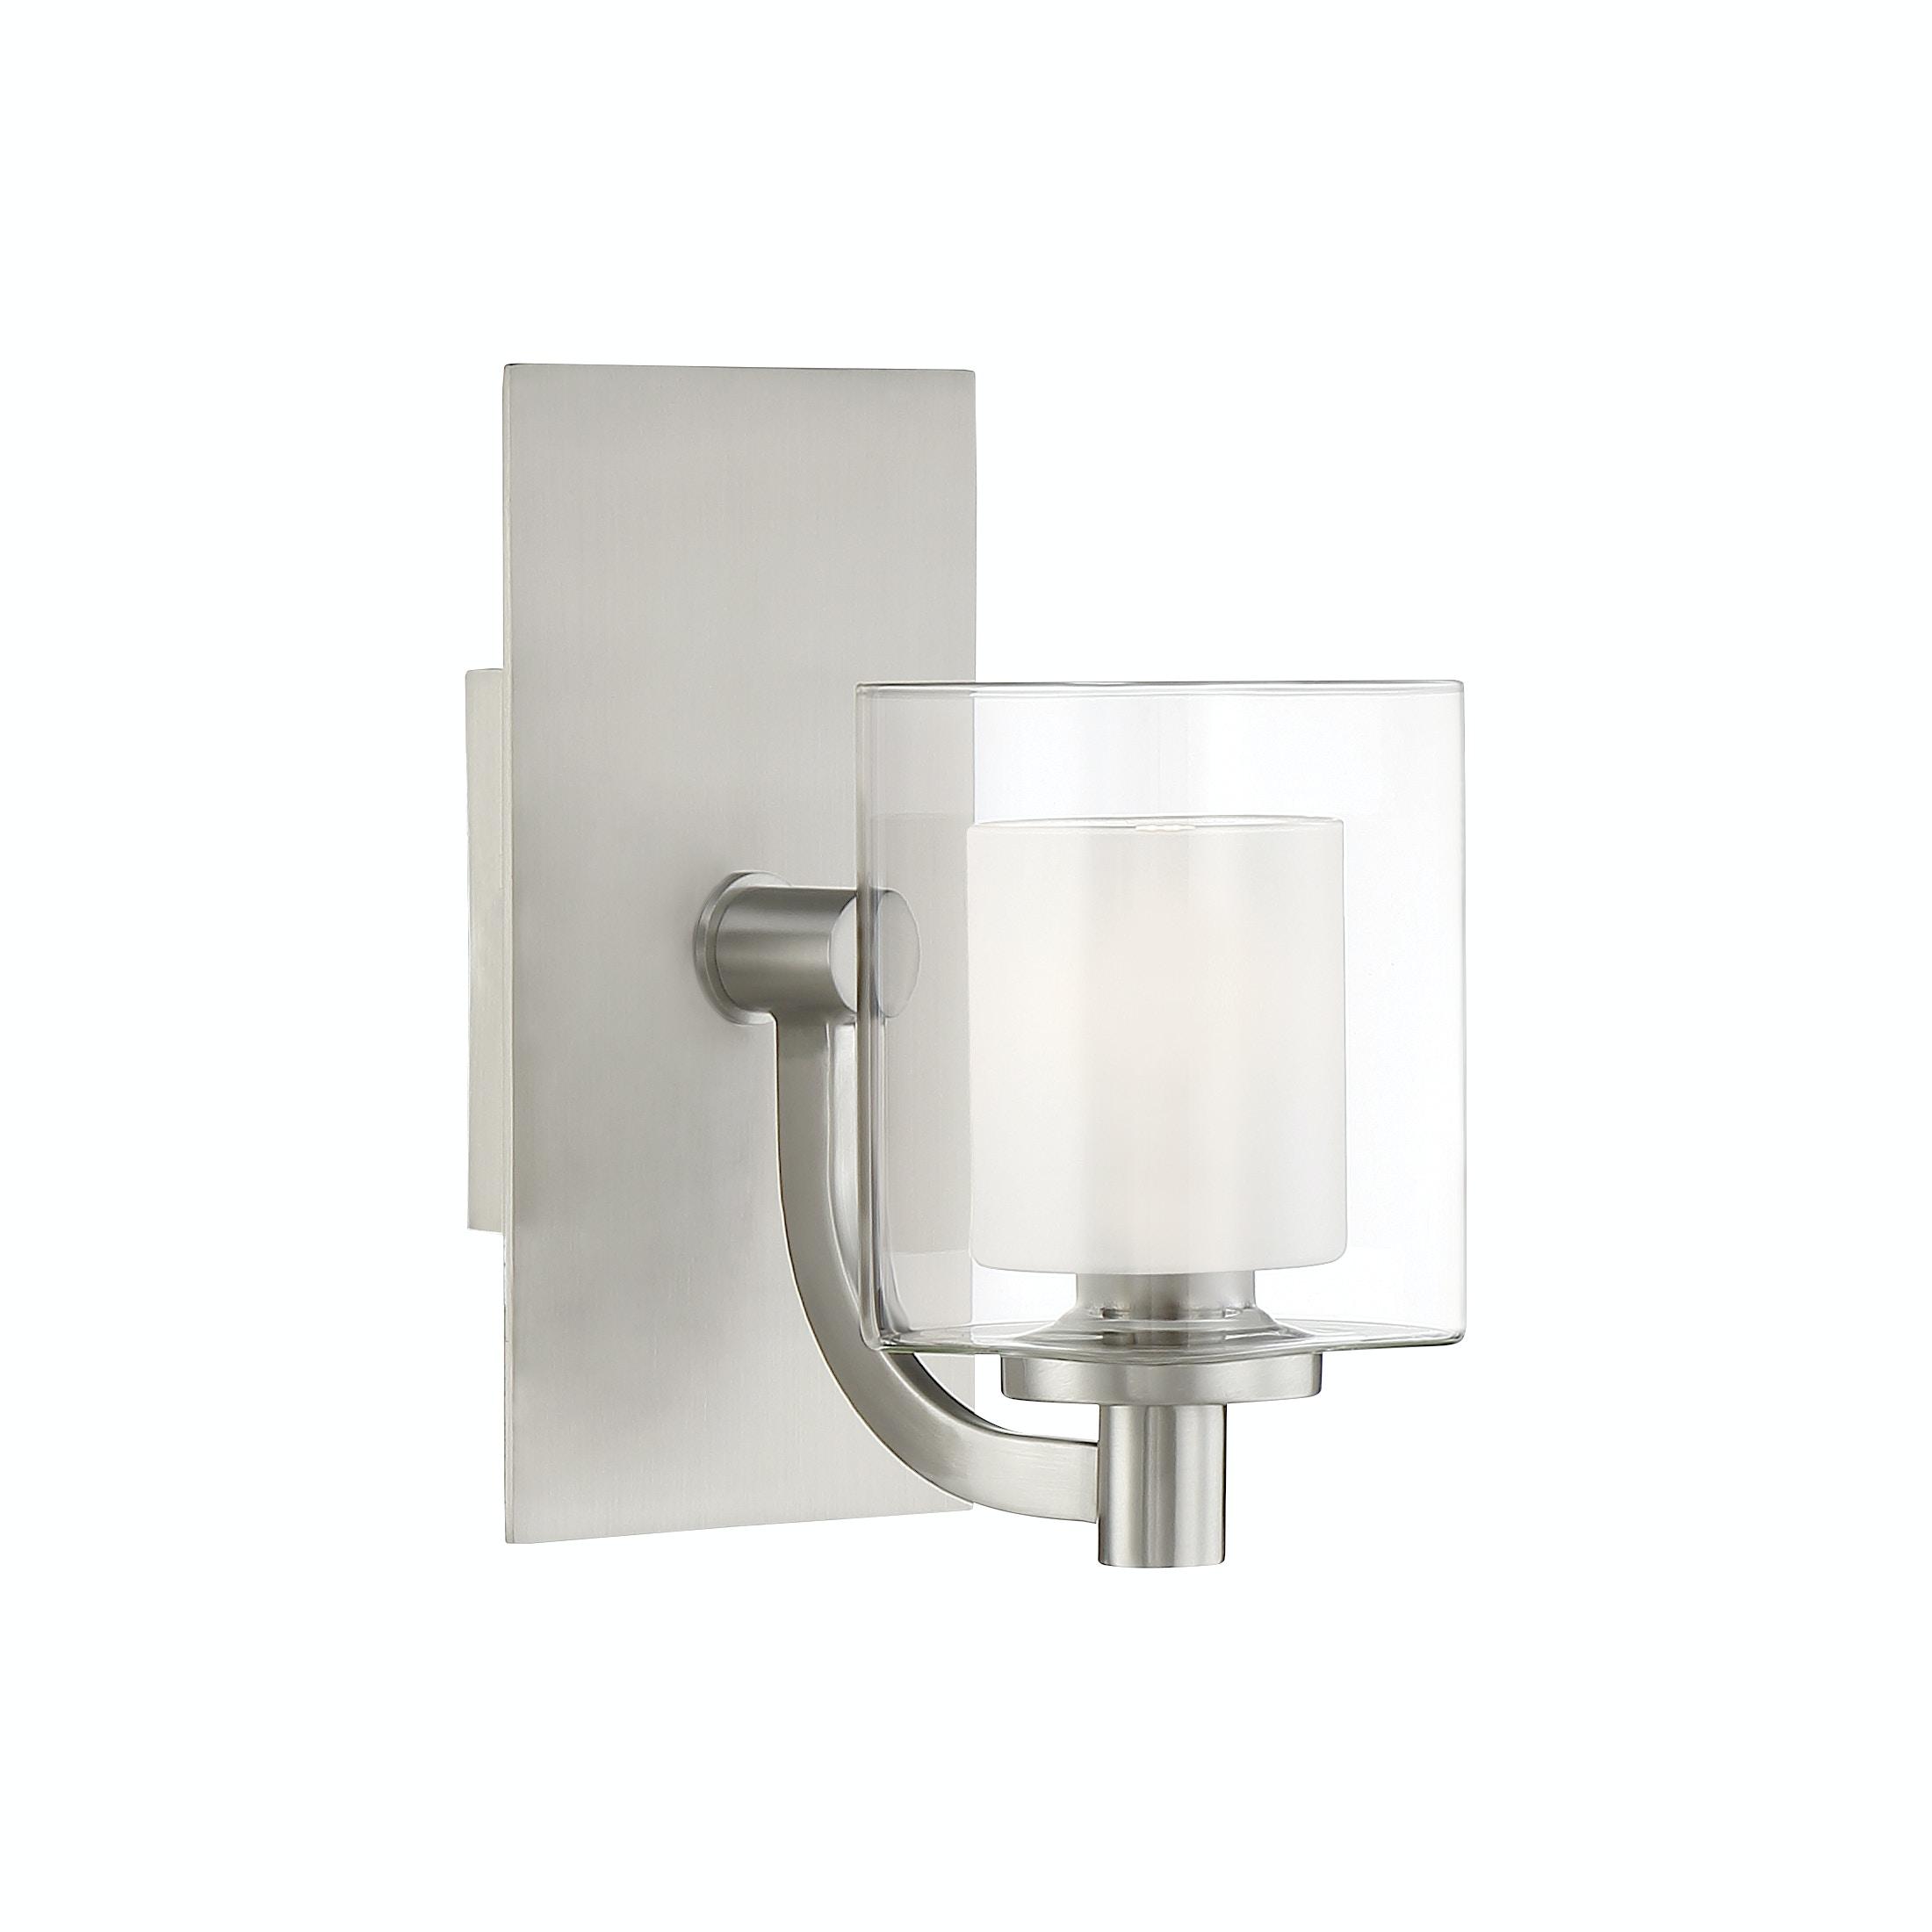 quoizel bathroom lighting swarovski strass crystal quoizel bath light klt8601bnled lamps and lighting tip top